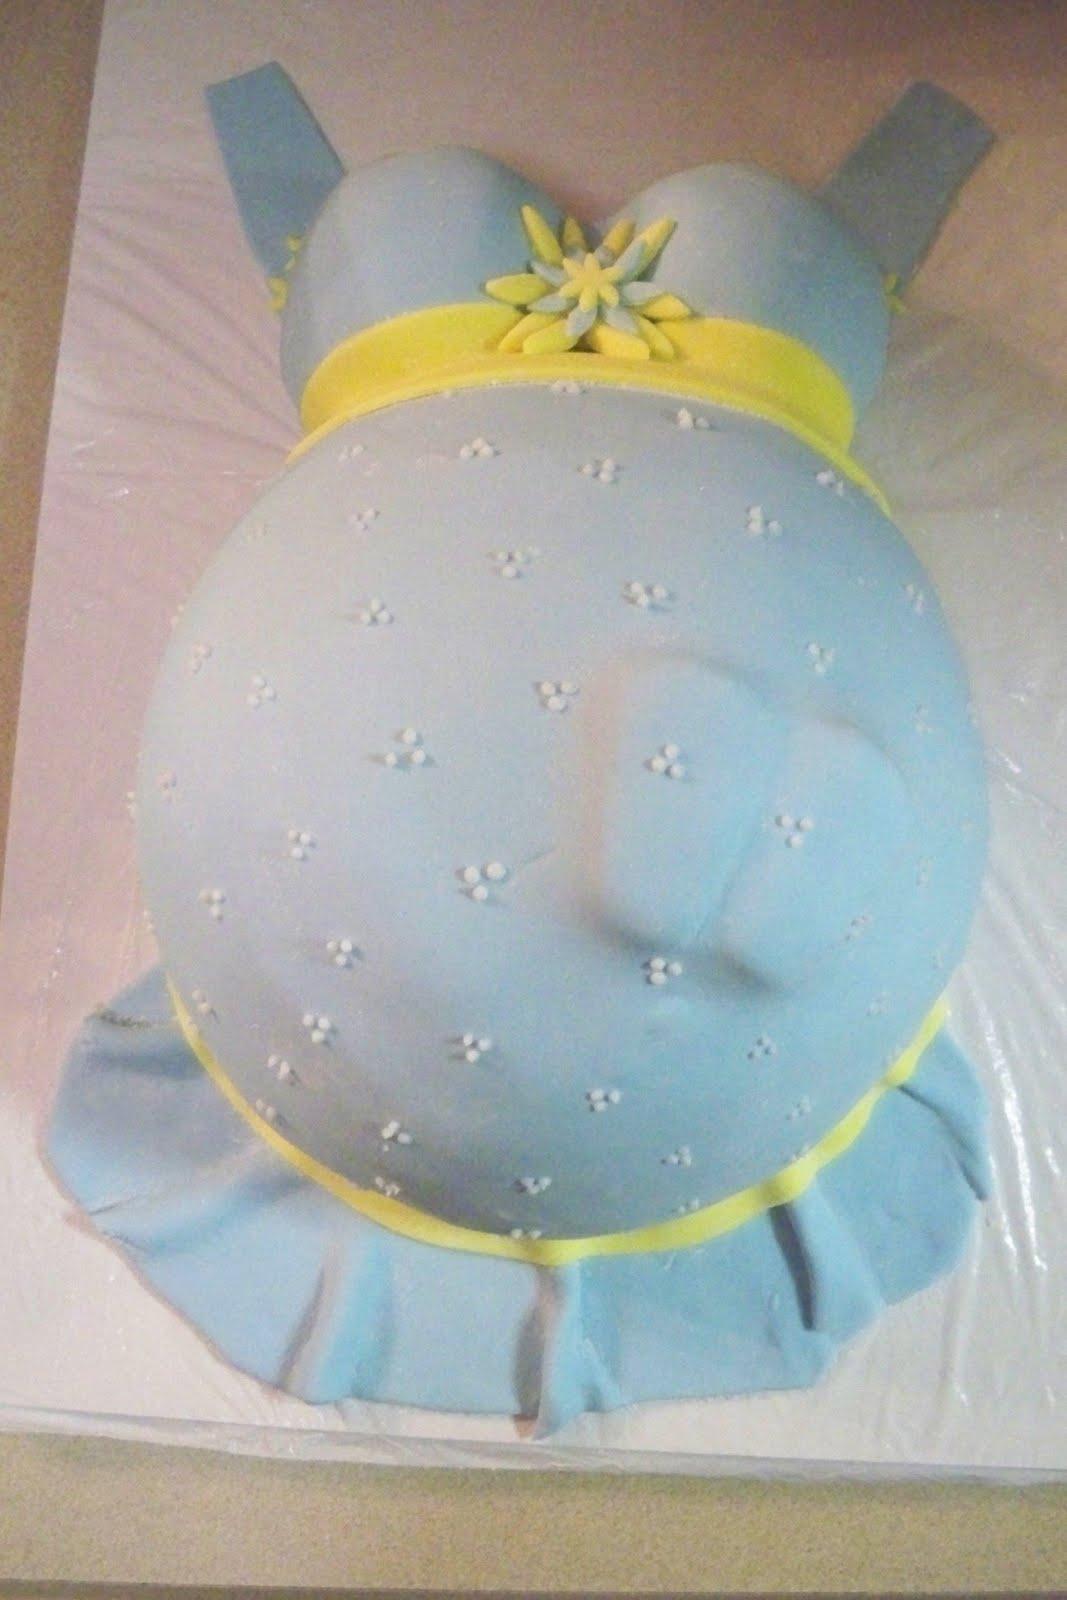 Baby Shower Cakes: Easy Baby Shower Cake Ideas Boy